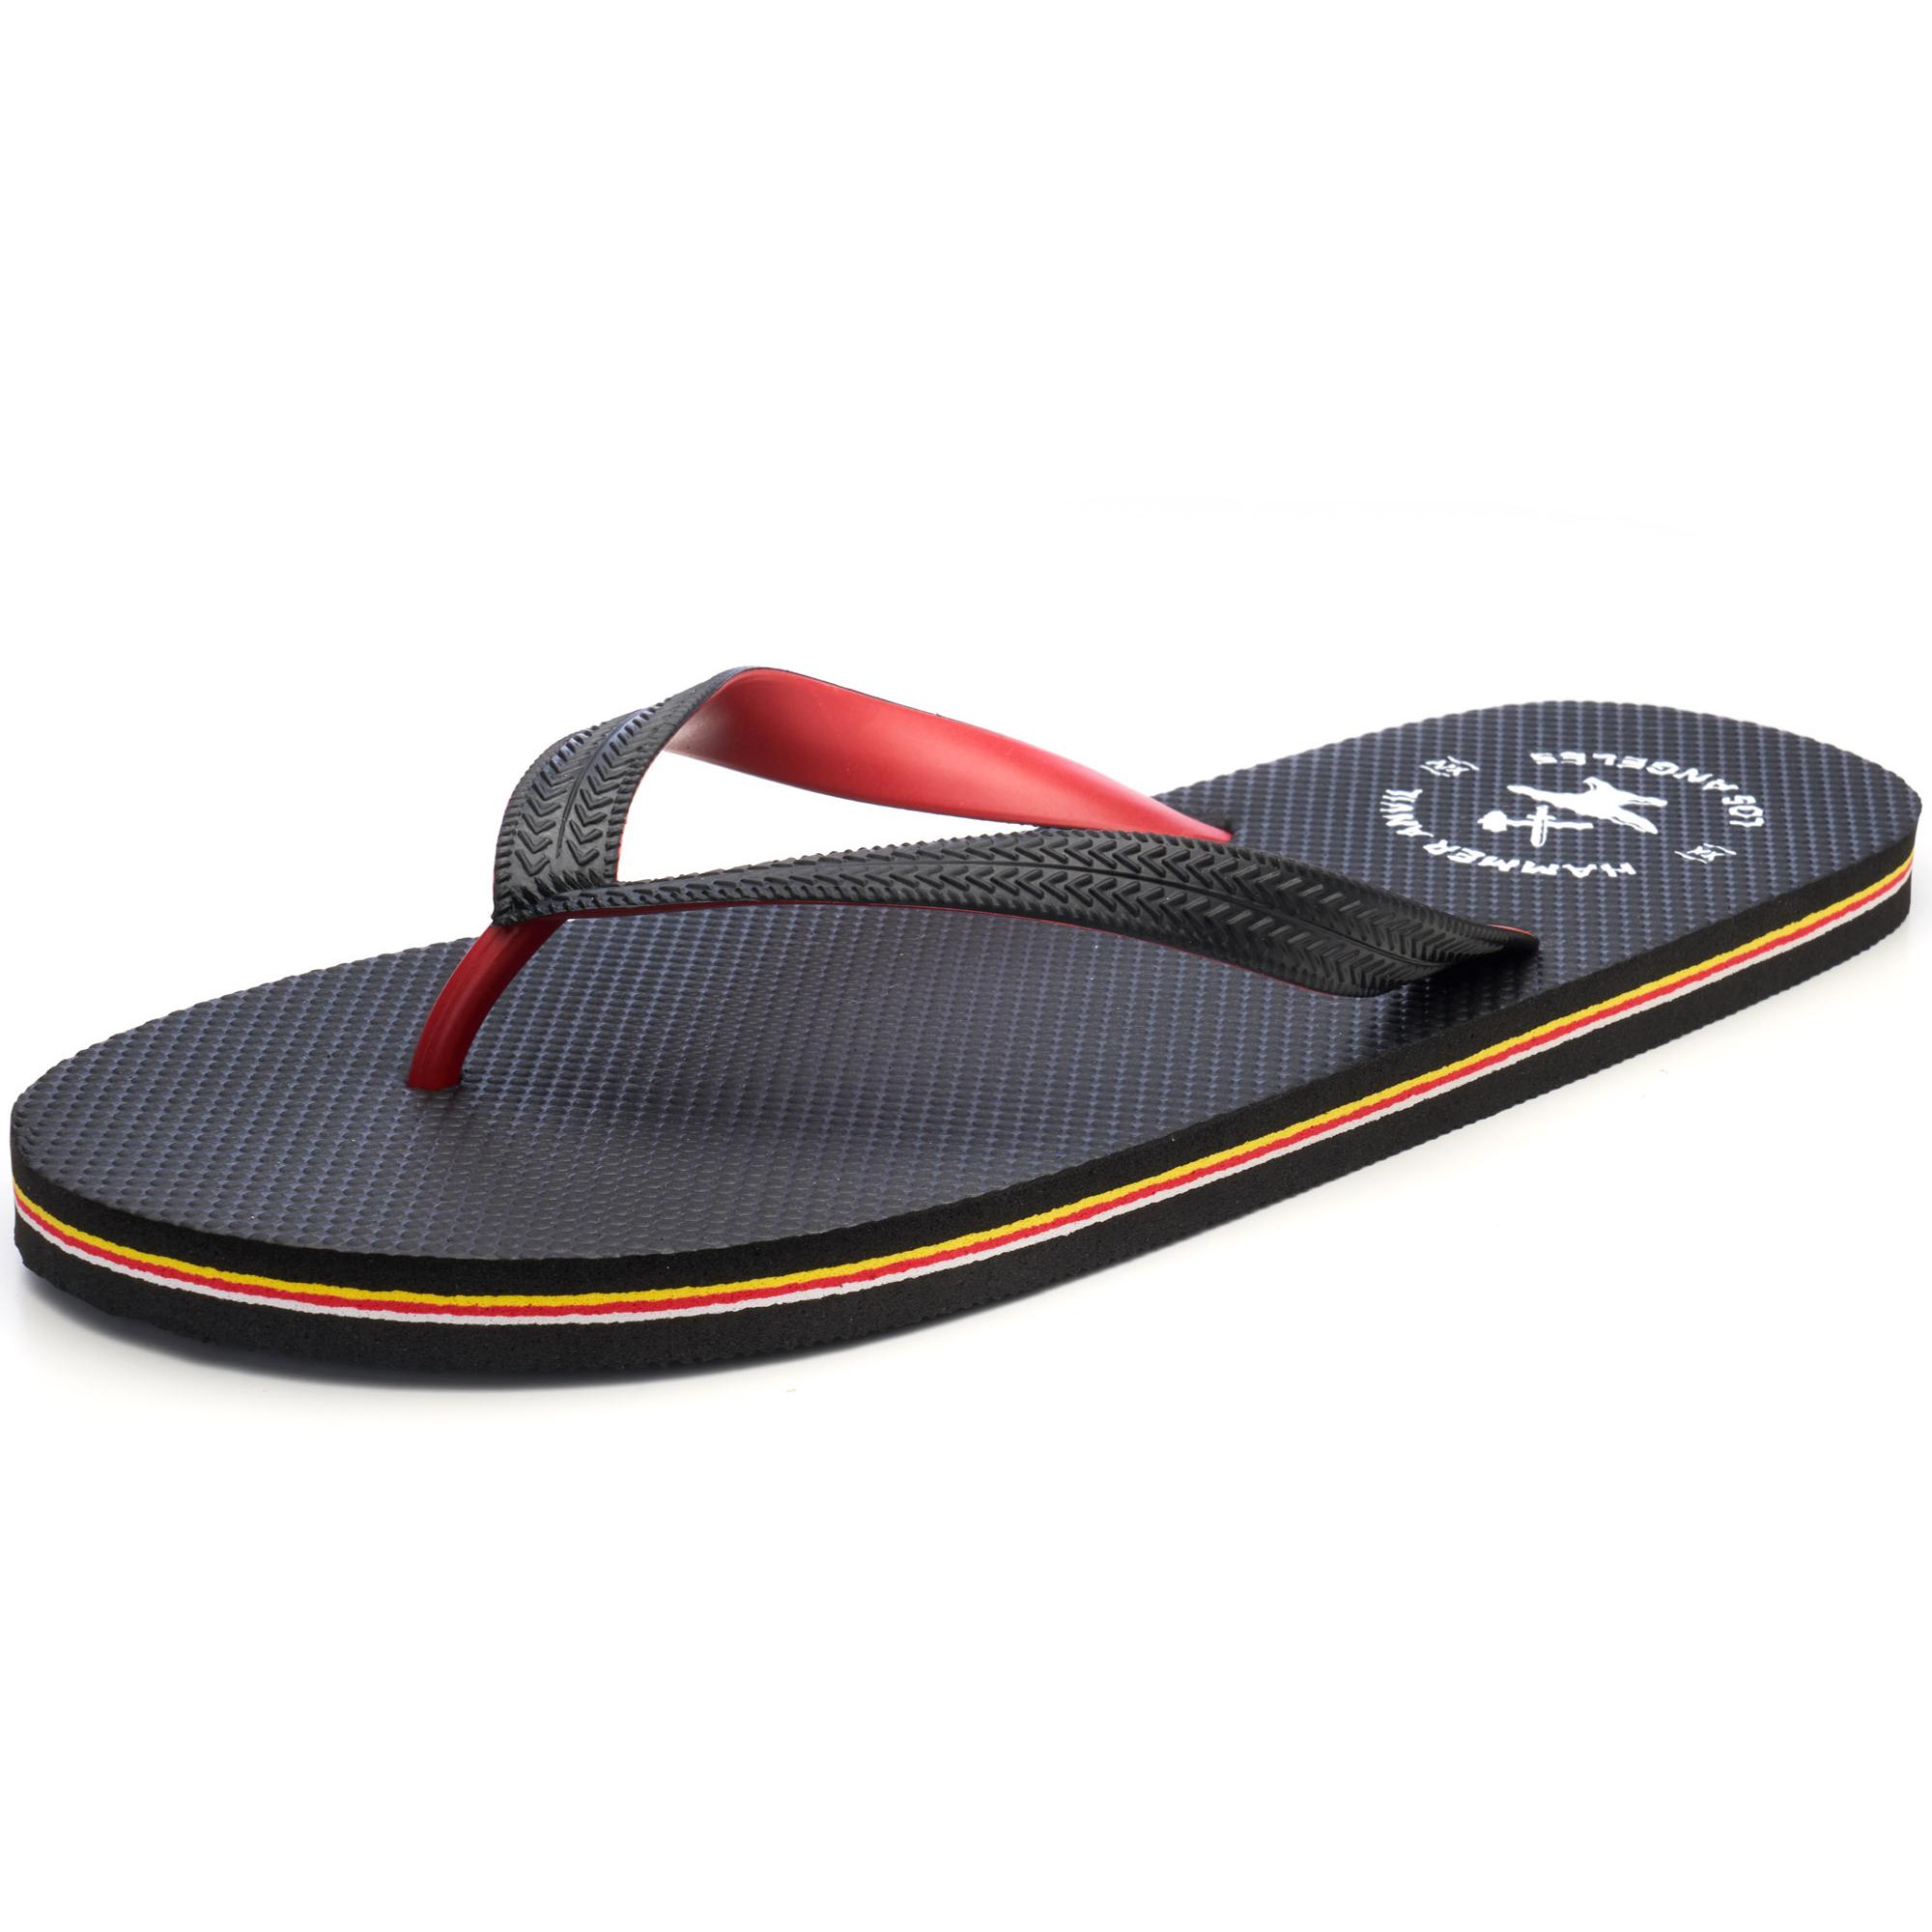 Hammer-Anvil-Mens-Flip-Flops-Casual-Thong-Summer-Sandals-Comfortable-Beach-Shoes thumbnail 30